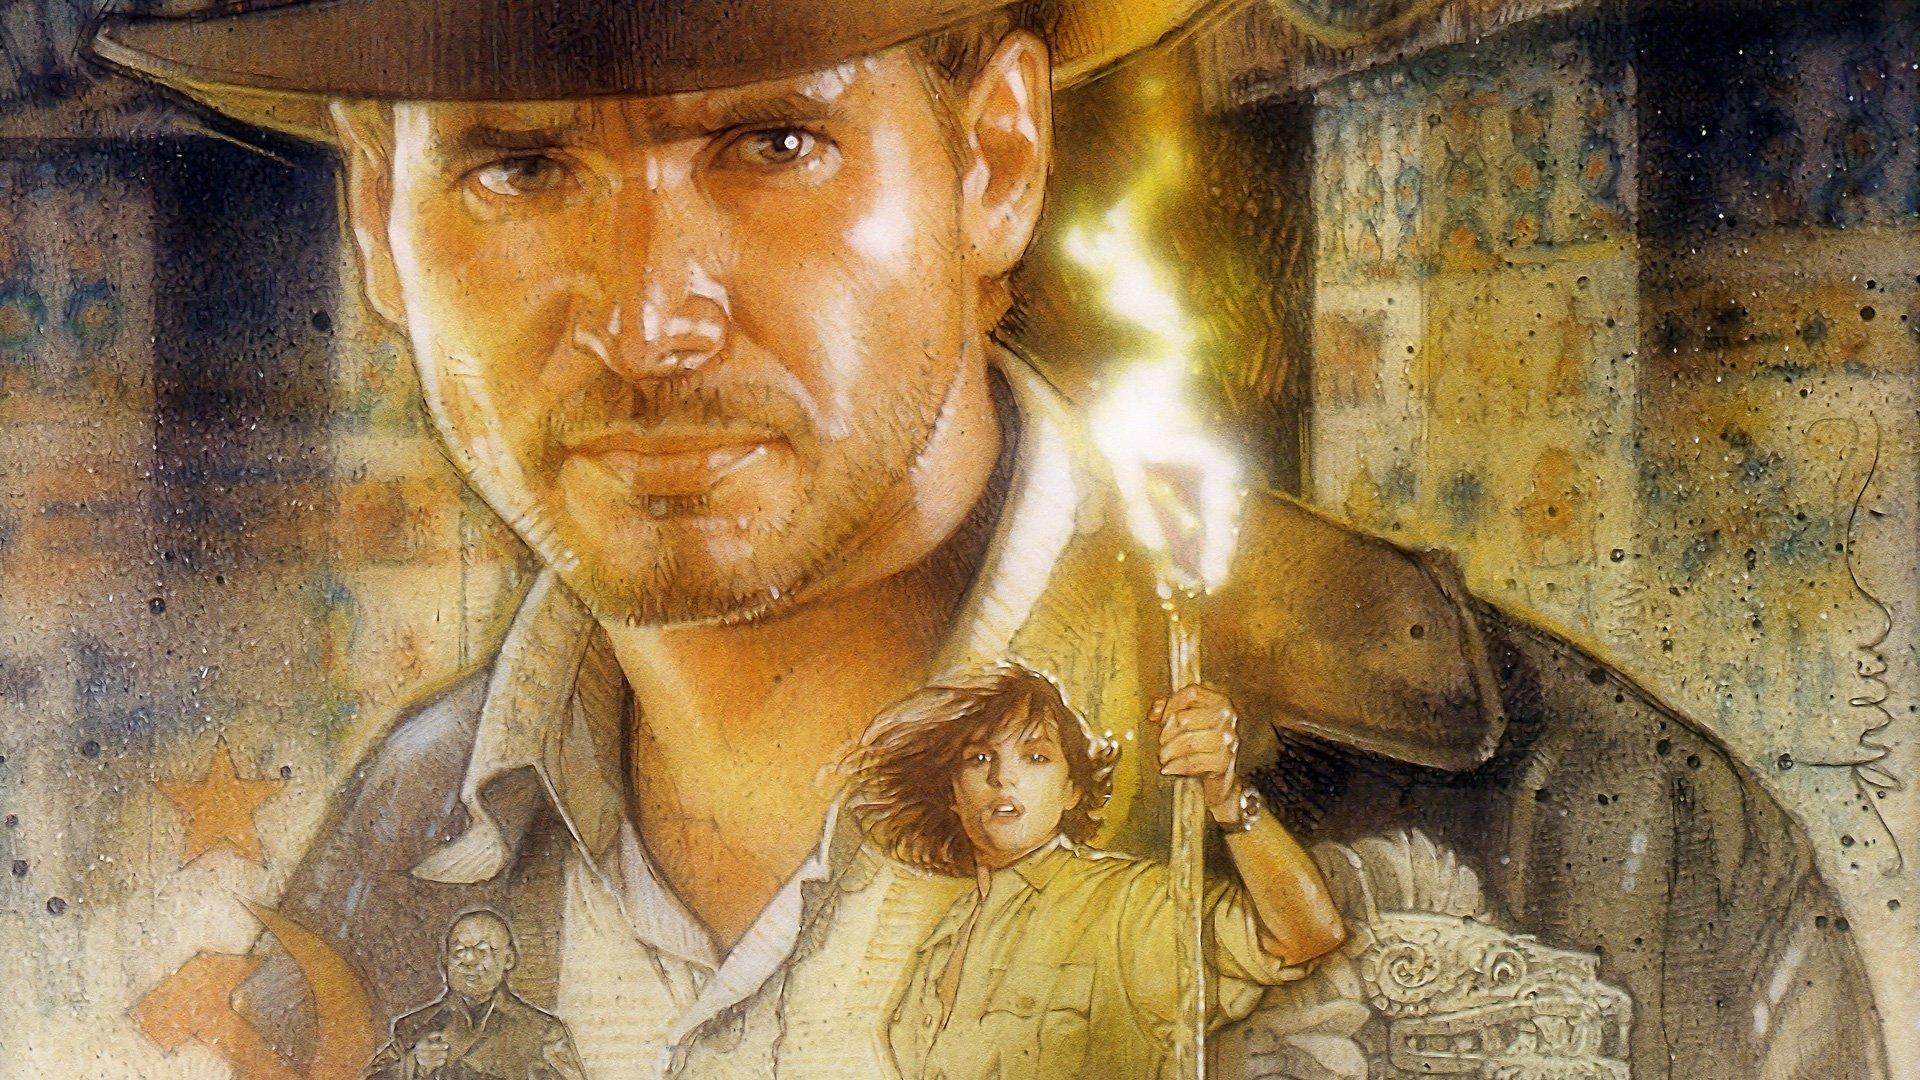 Indiana Jones And The Infernal Machine Full HD Wallpaper